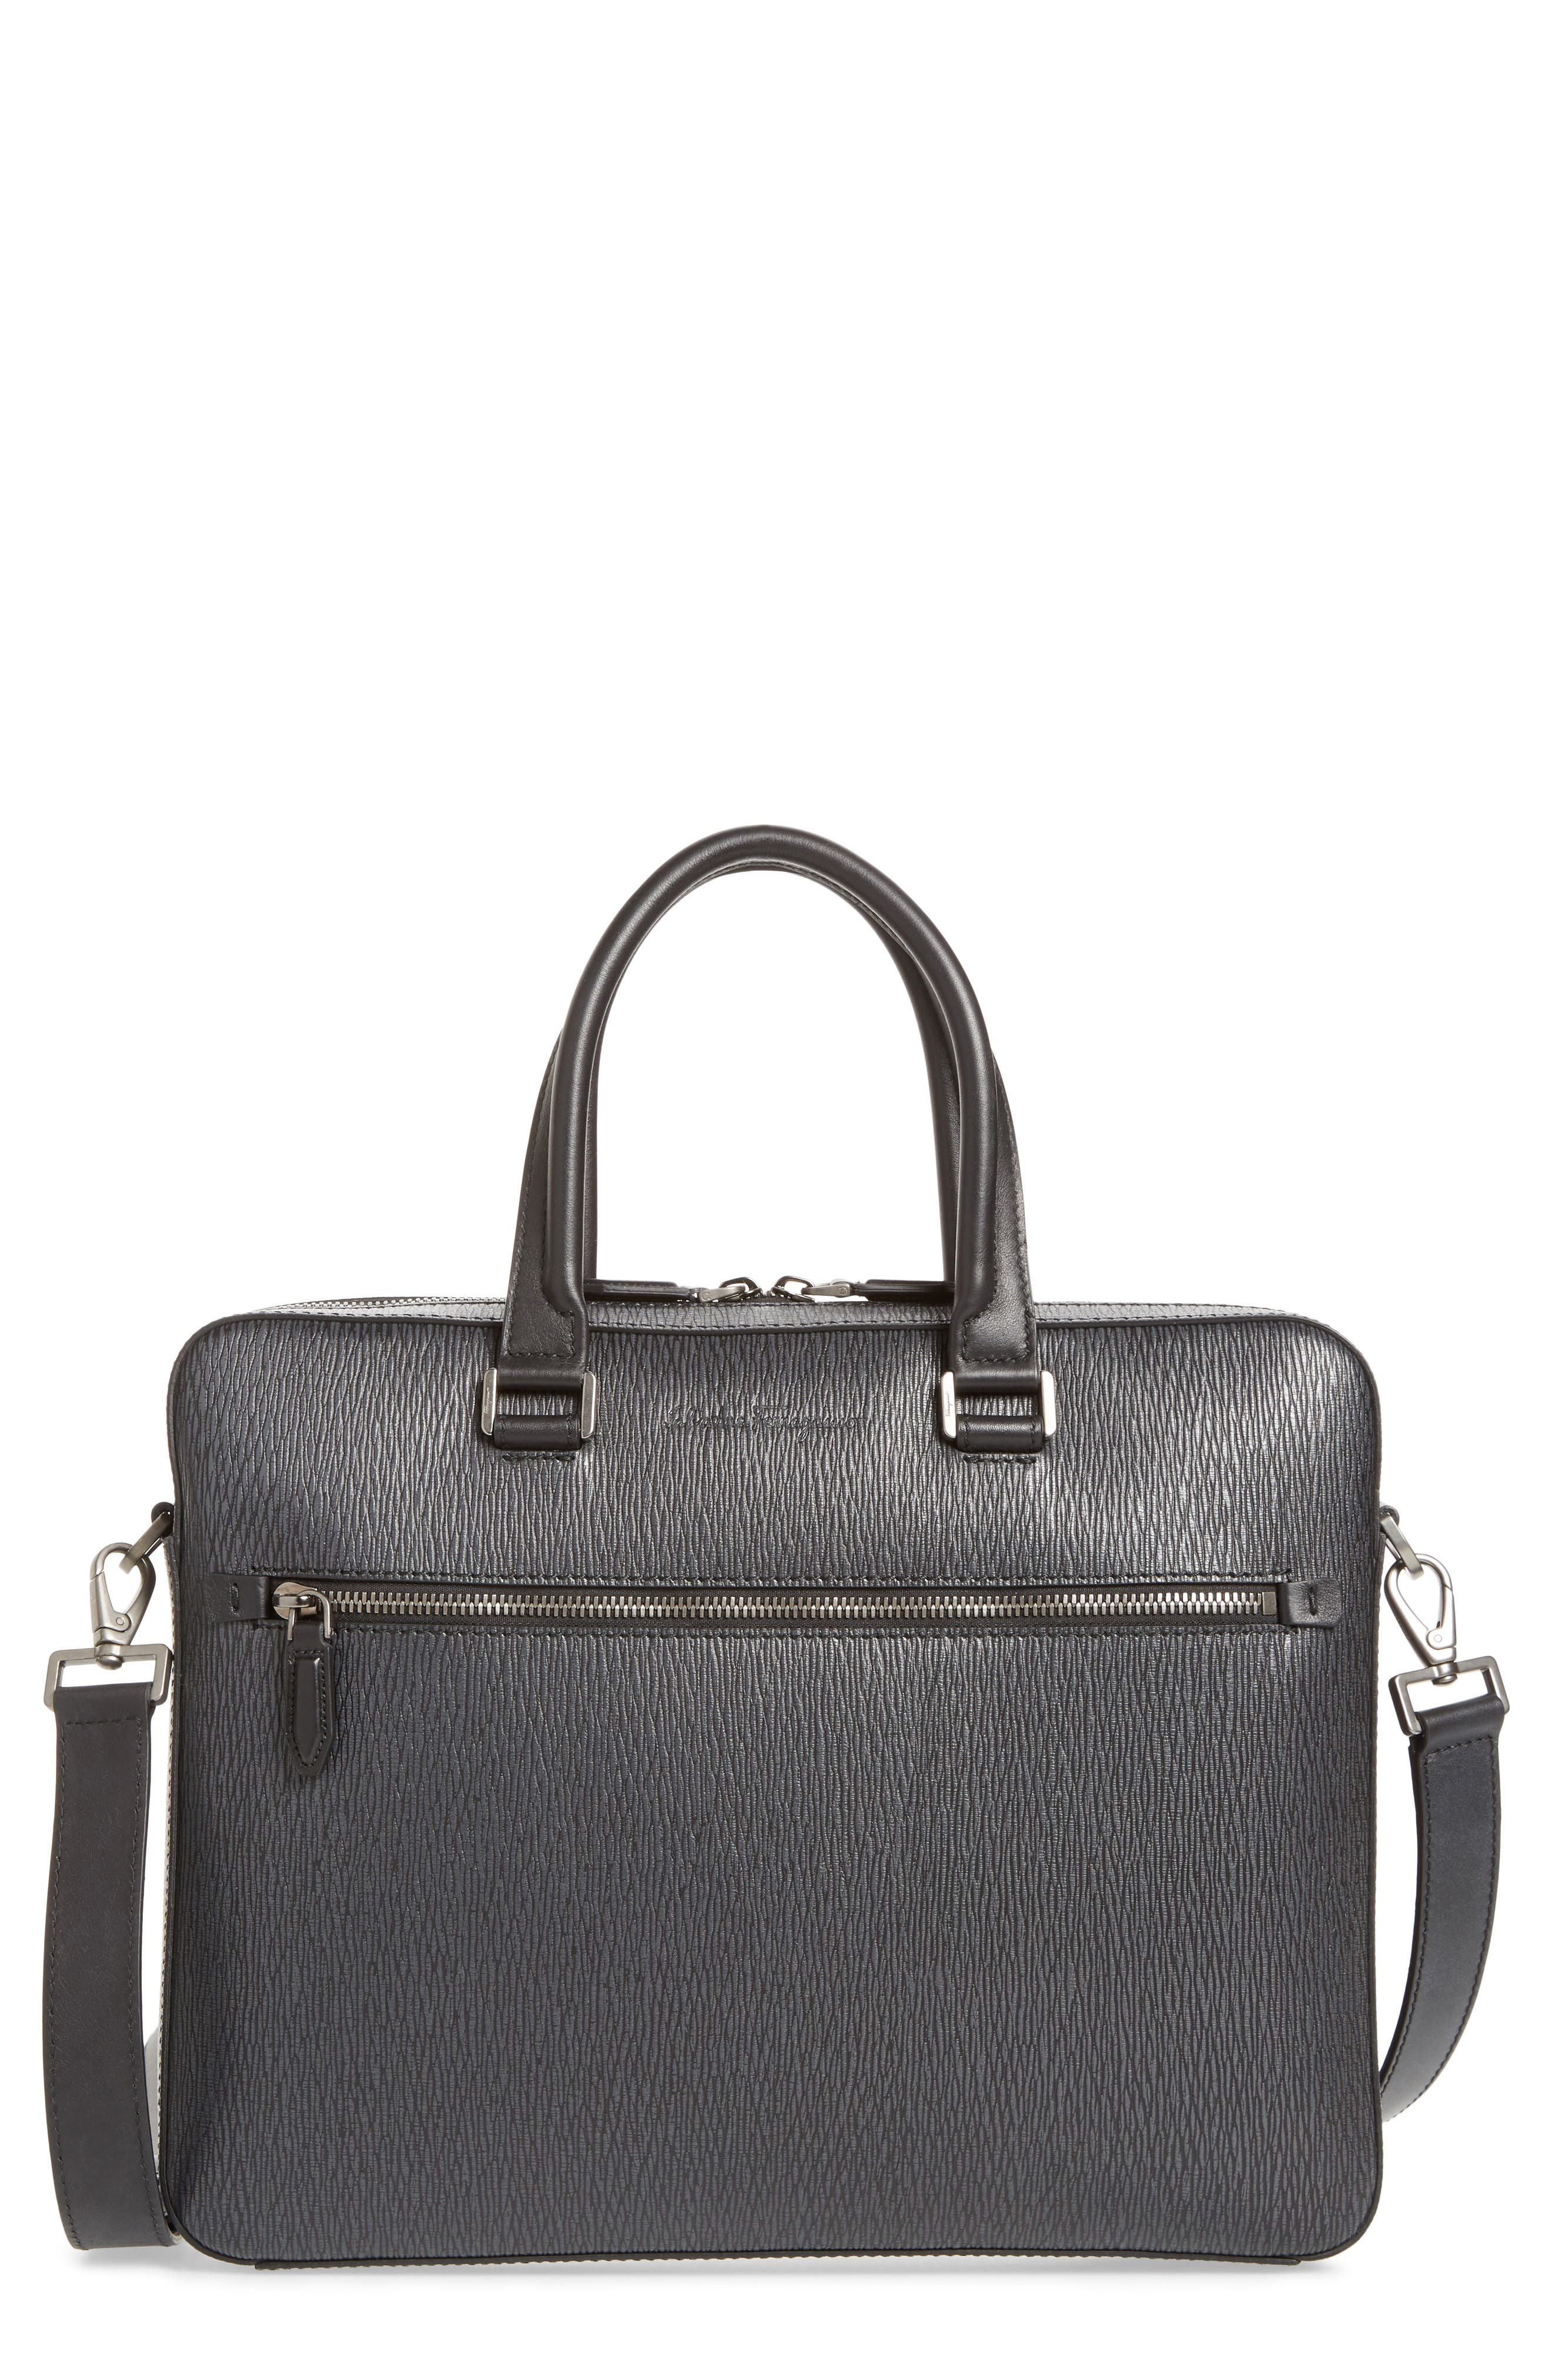 SALVATORE FERRAGAMO Textured Leather Briefcase, Main, color, GRIGIO/ NERO